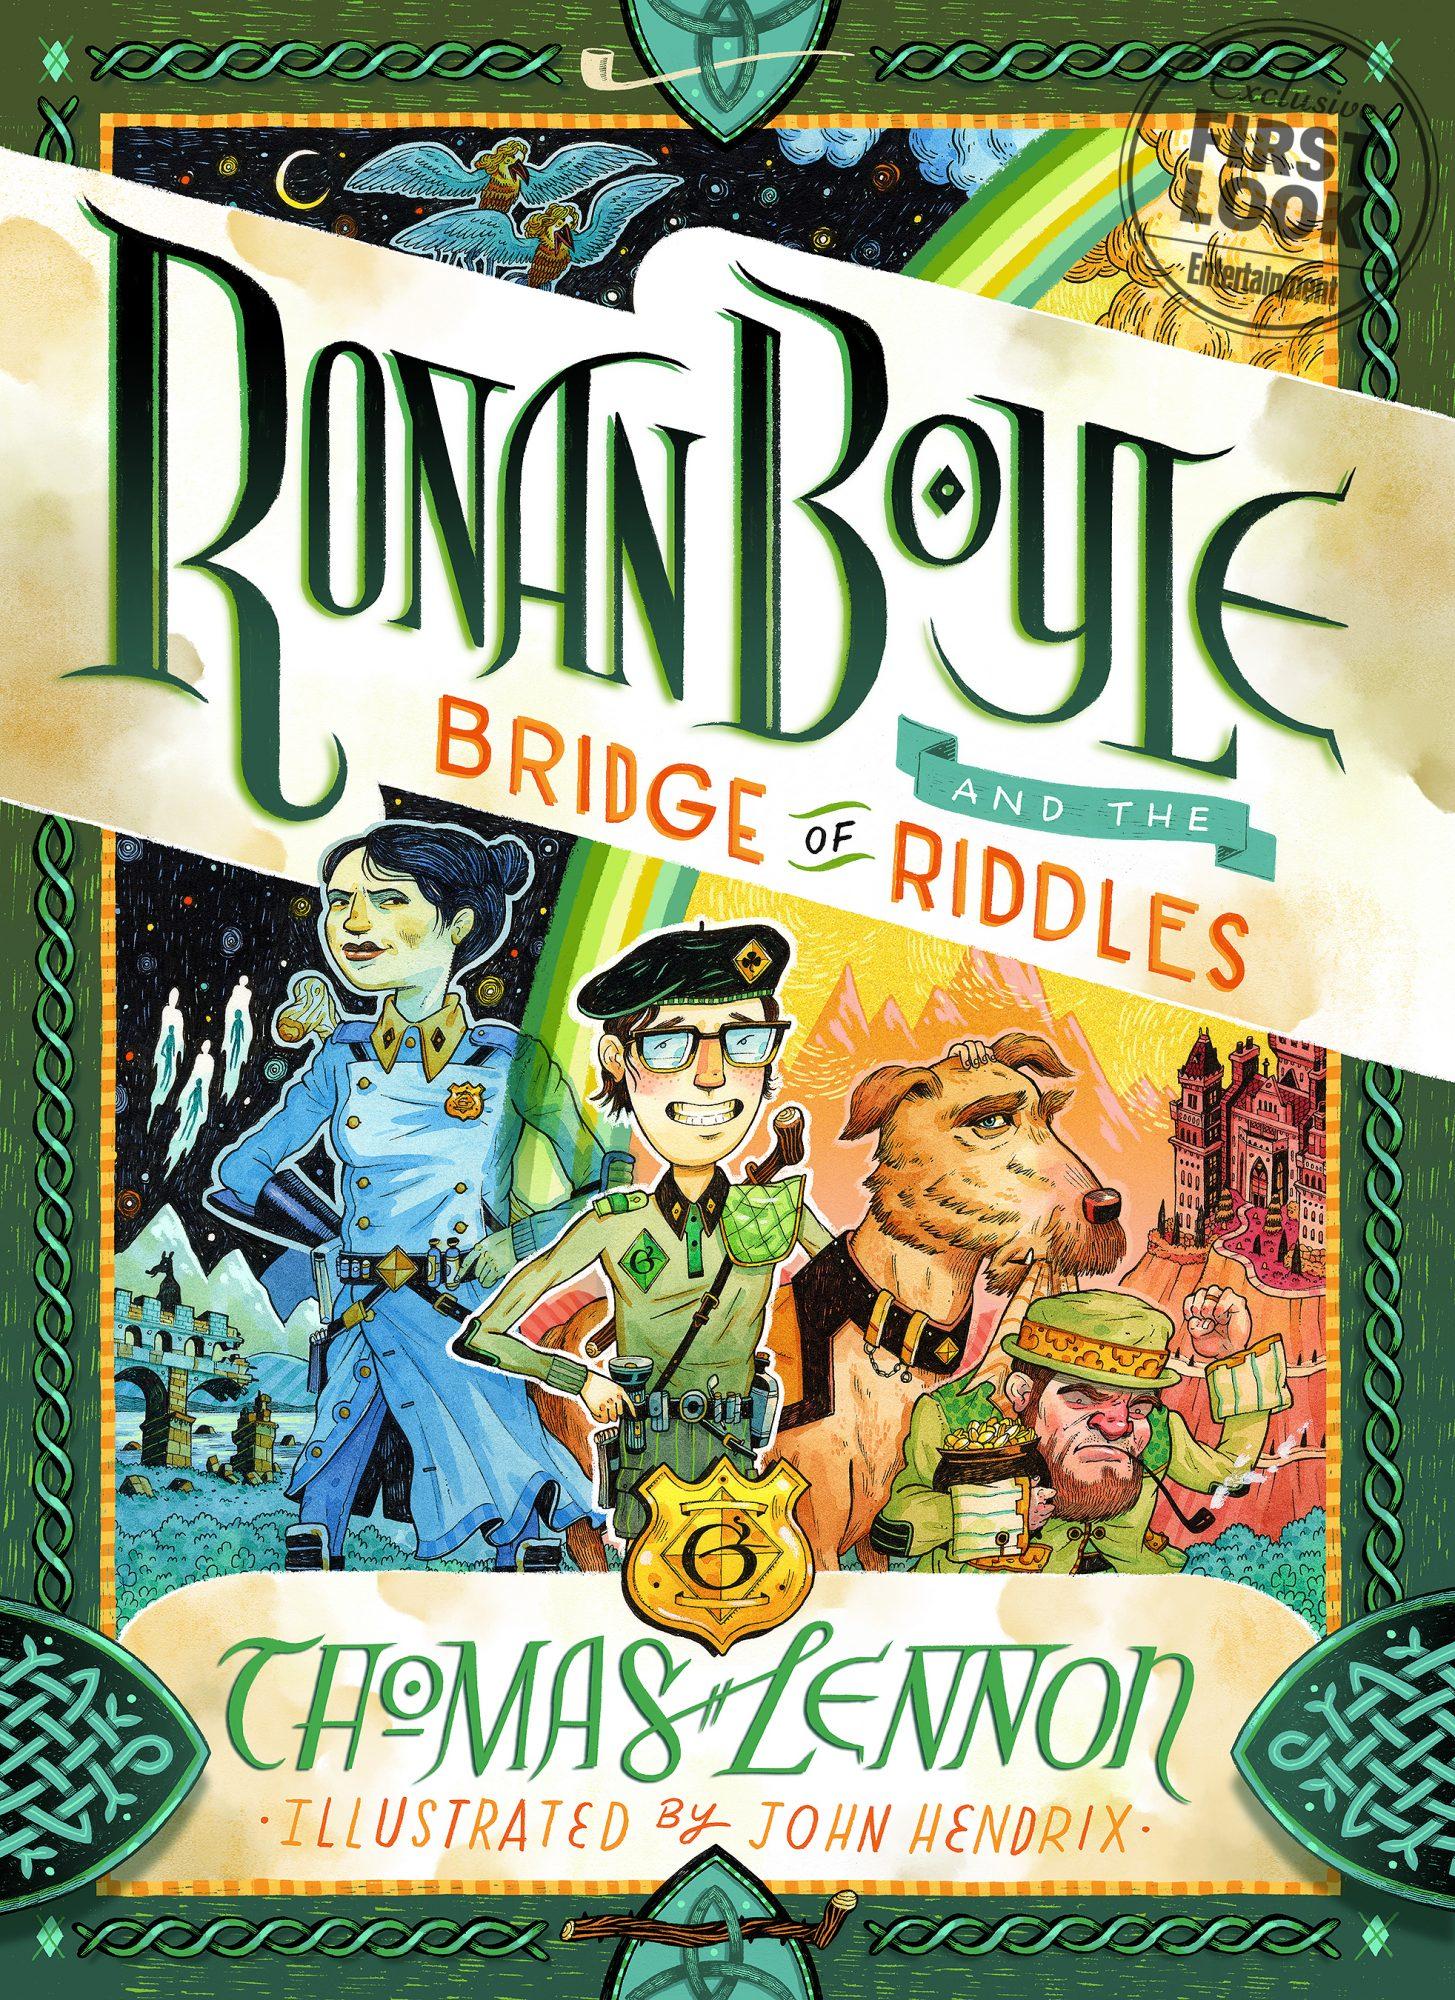 Thomas Lennon book announcement Ronan Boyle and the Bridge of Riddles